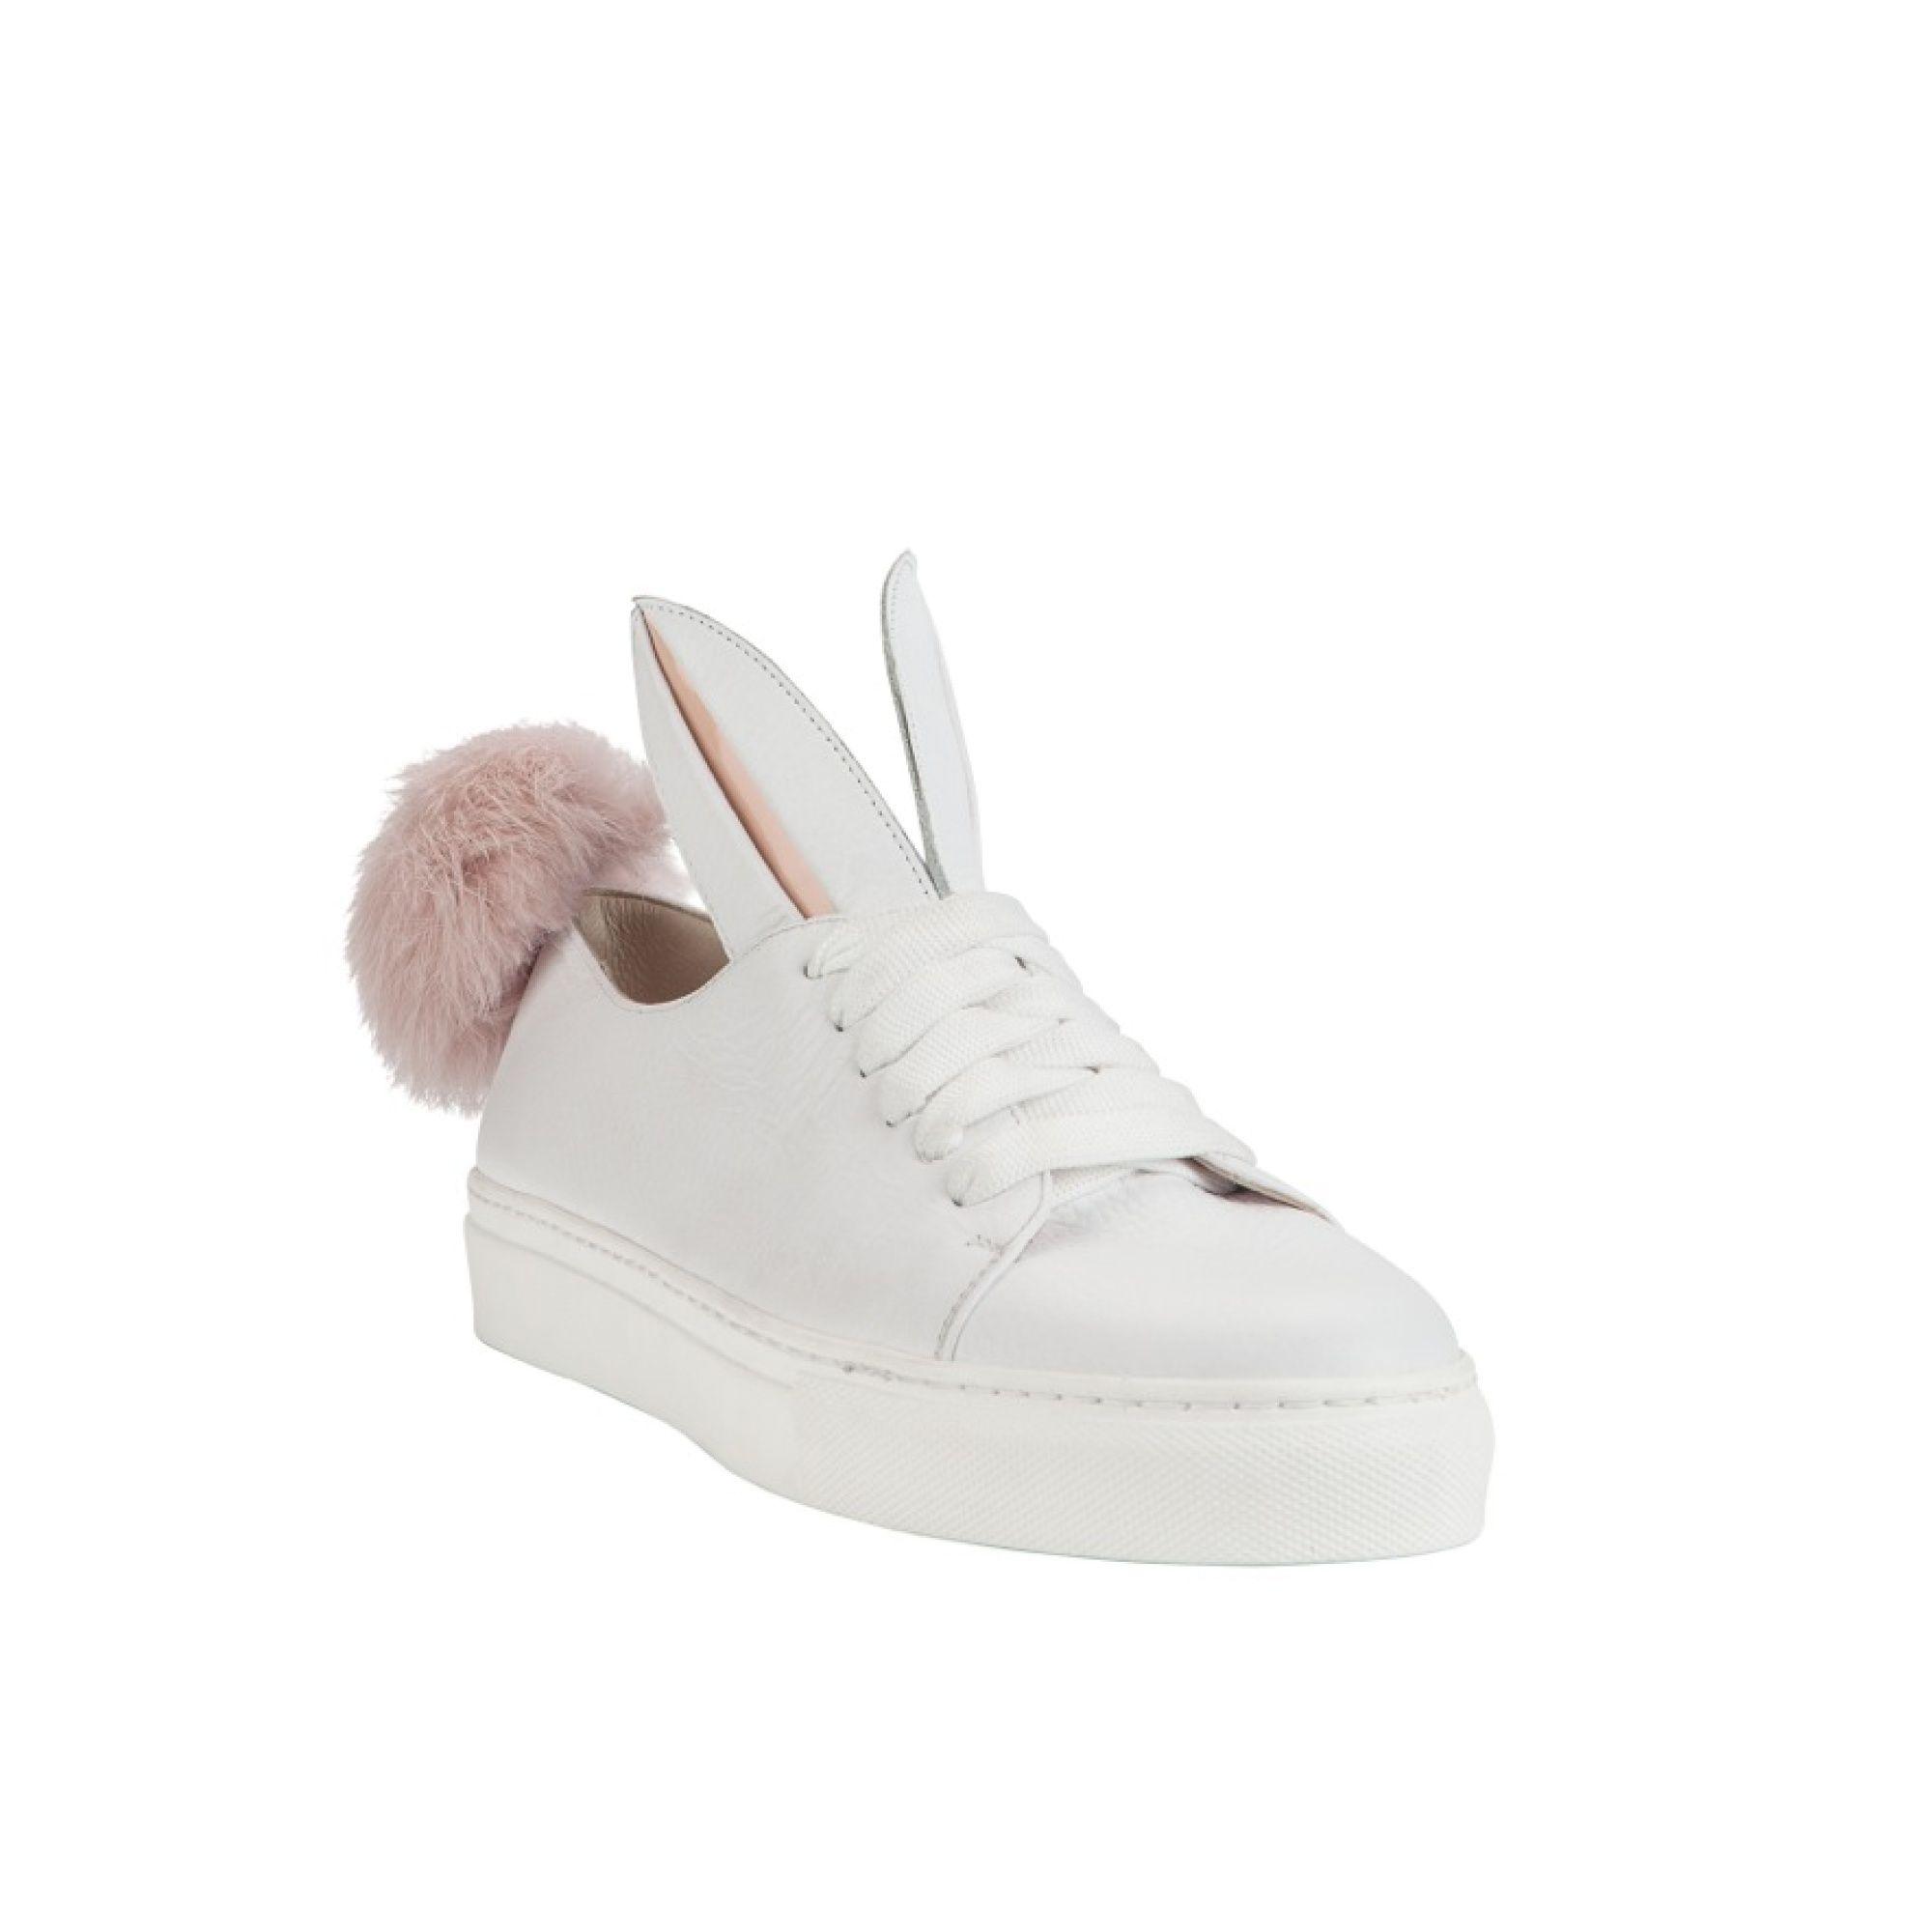 Chaussures - Bas-tops Et Baskets Aerin OaDaD9LroC